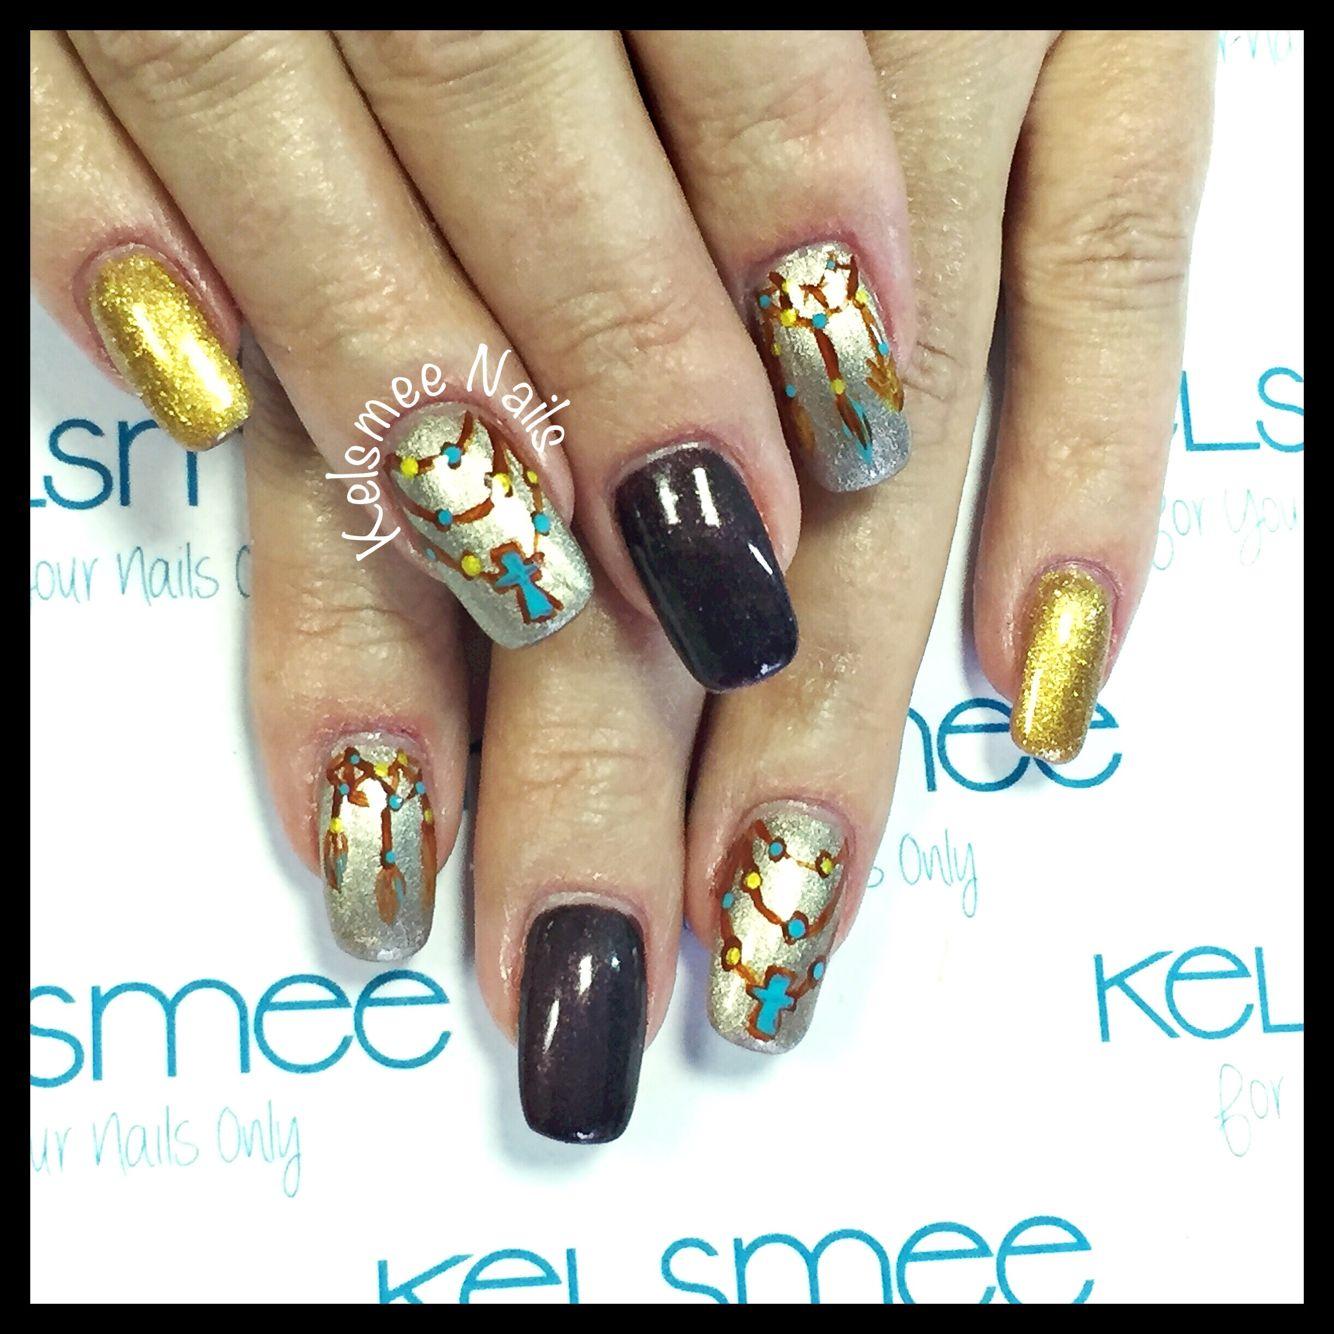 Acrylic nails with maniQ overlay And bohemian nailart | Wicked Nails ...